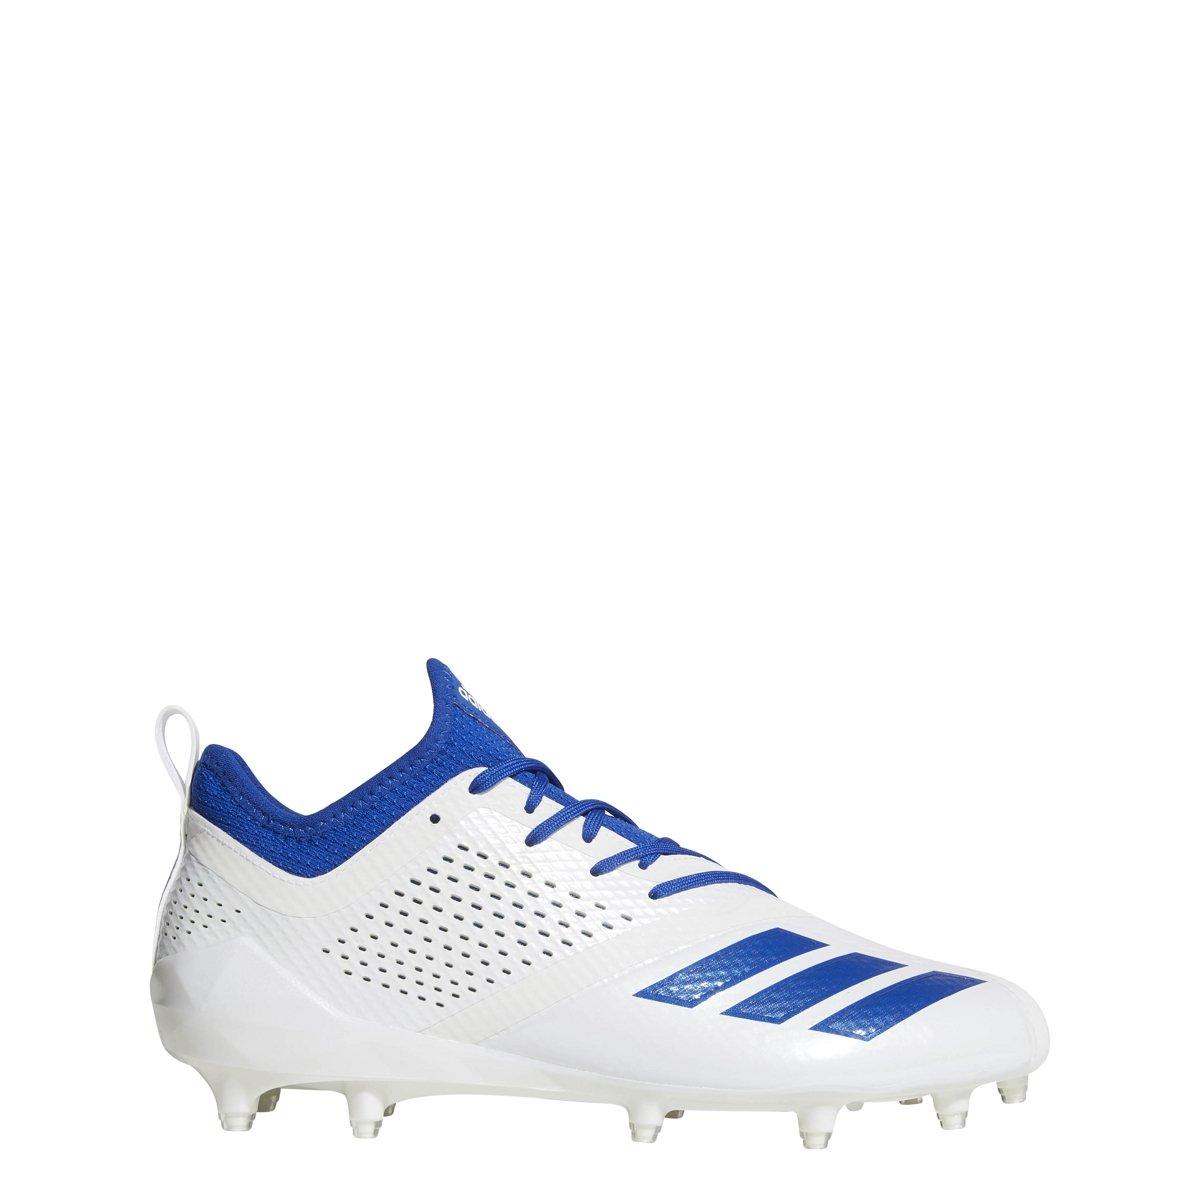 adidas Men's Adizero 5-Star 7.0 Football Shoe B07BHLC977 17 D(M) US|White-collegiate Royal